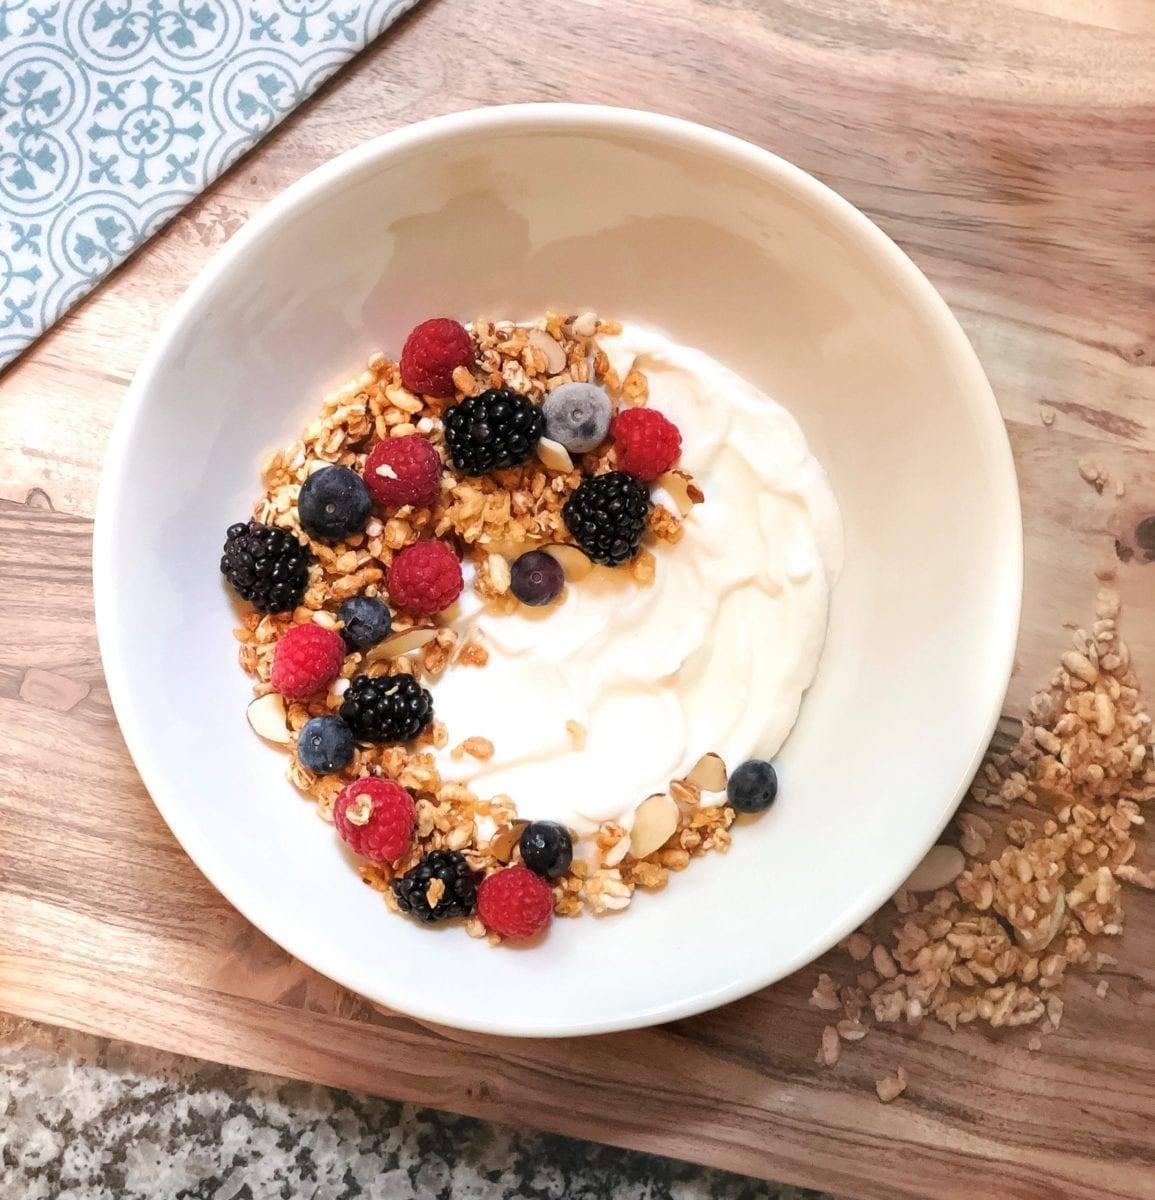 Berry Me: Granola Yogurt Bowl